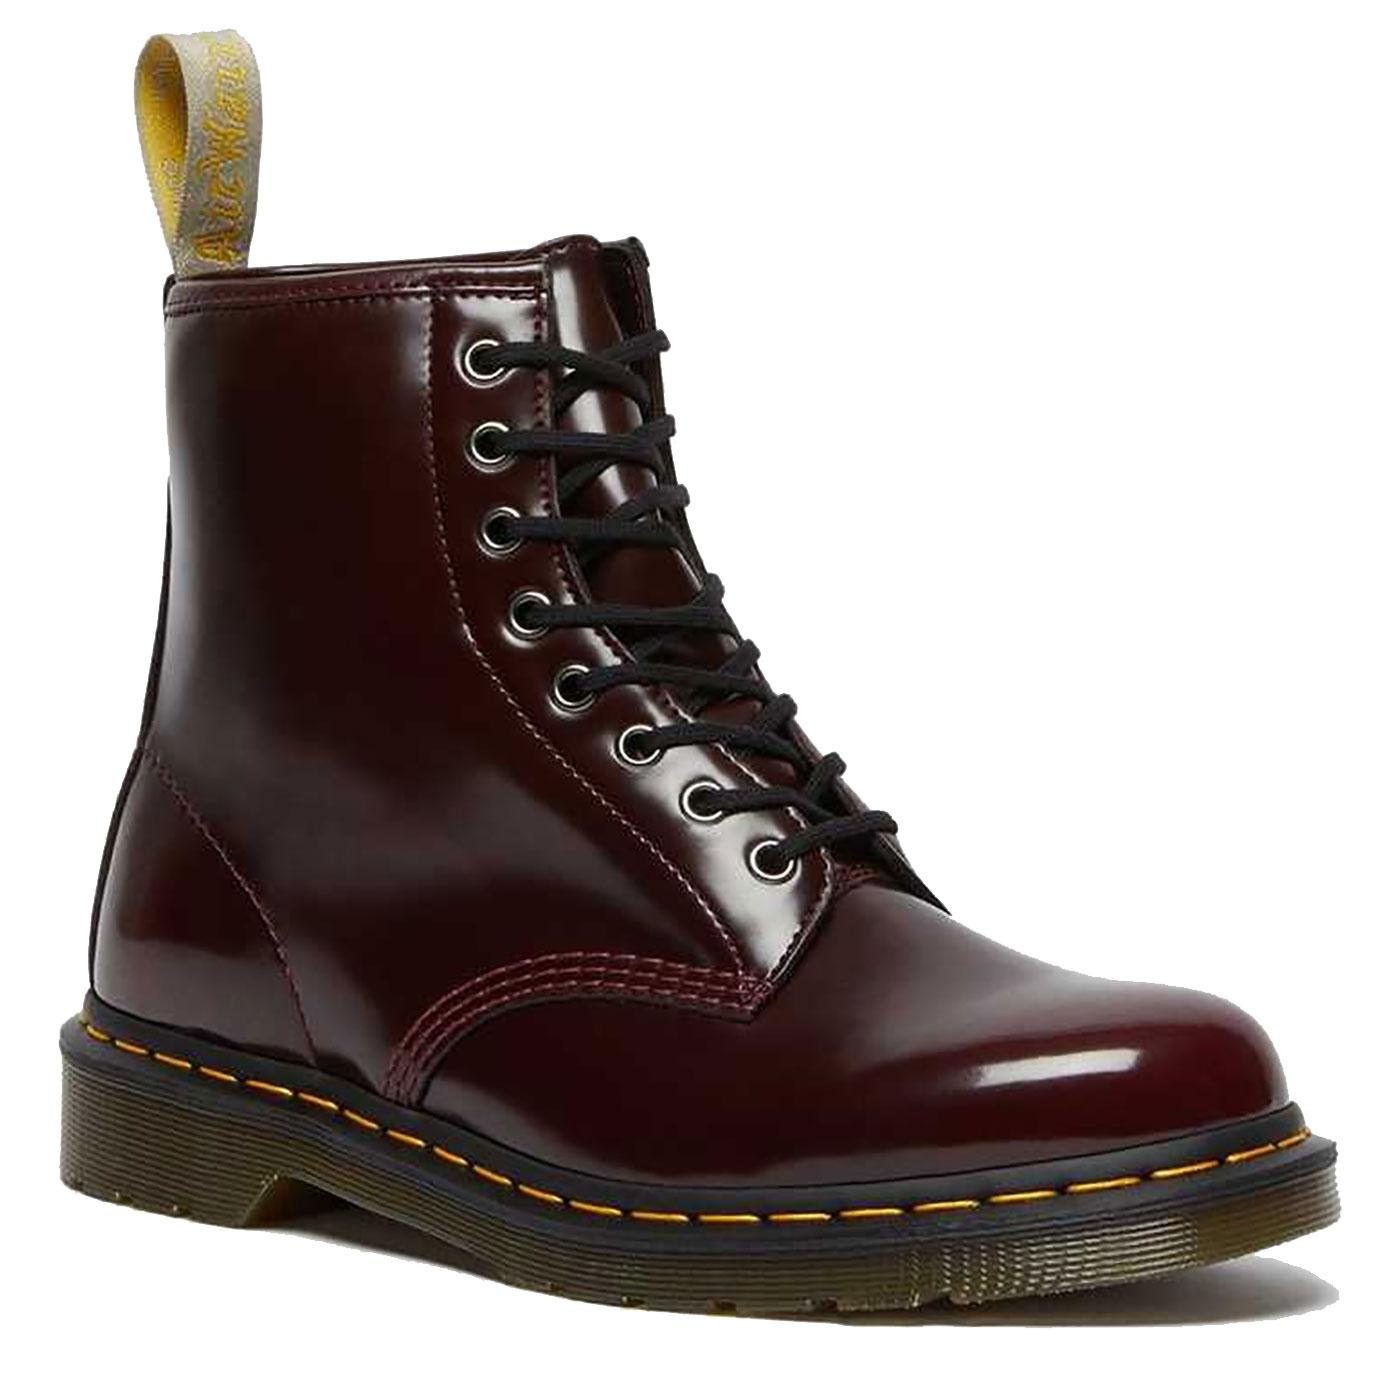 Vegan 1460 Oxford DR MARTENS Retro 1970's Boots CR